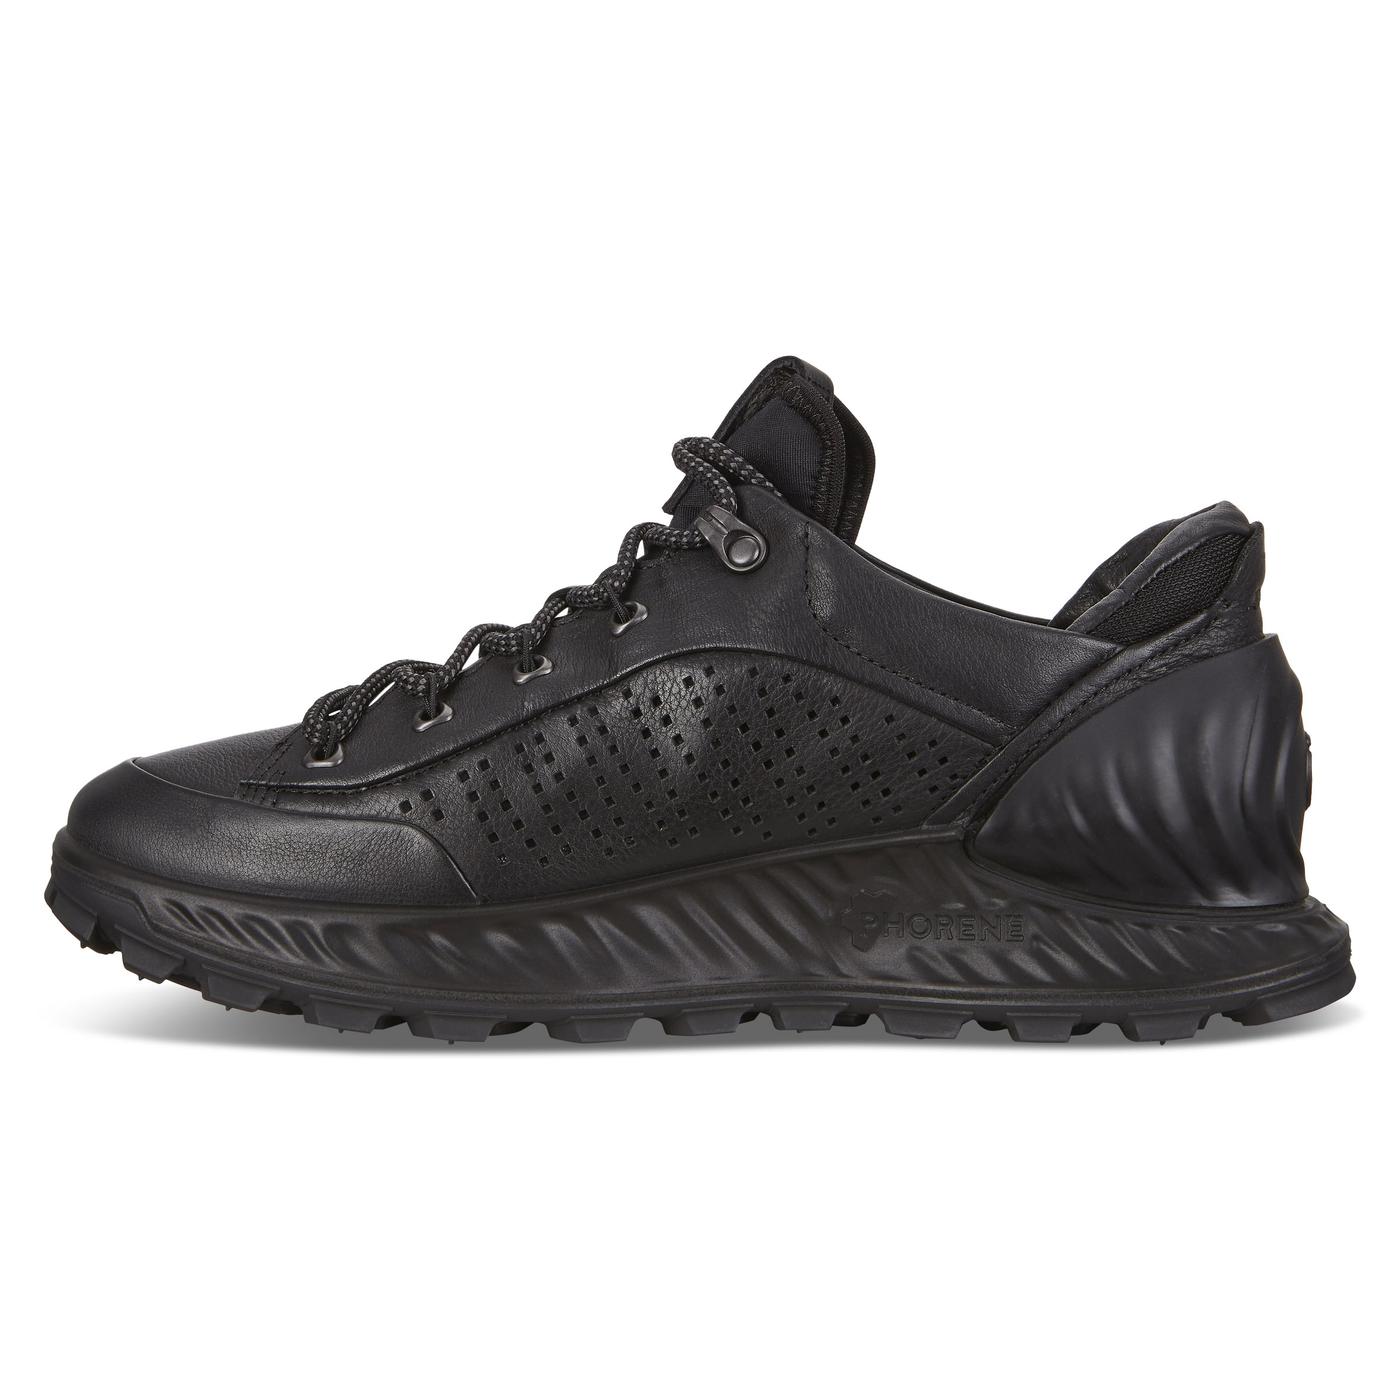 ECCO EXOSTRIKE Outdoor Shoe